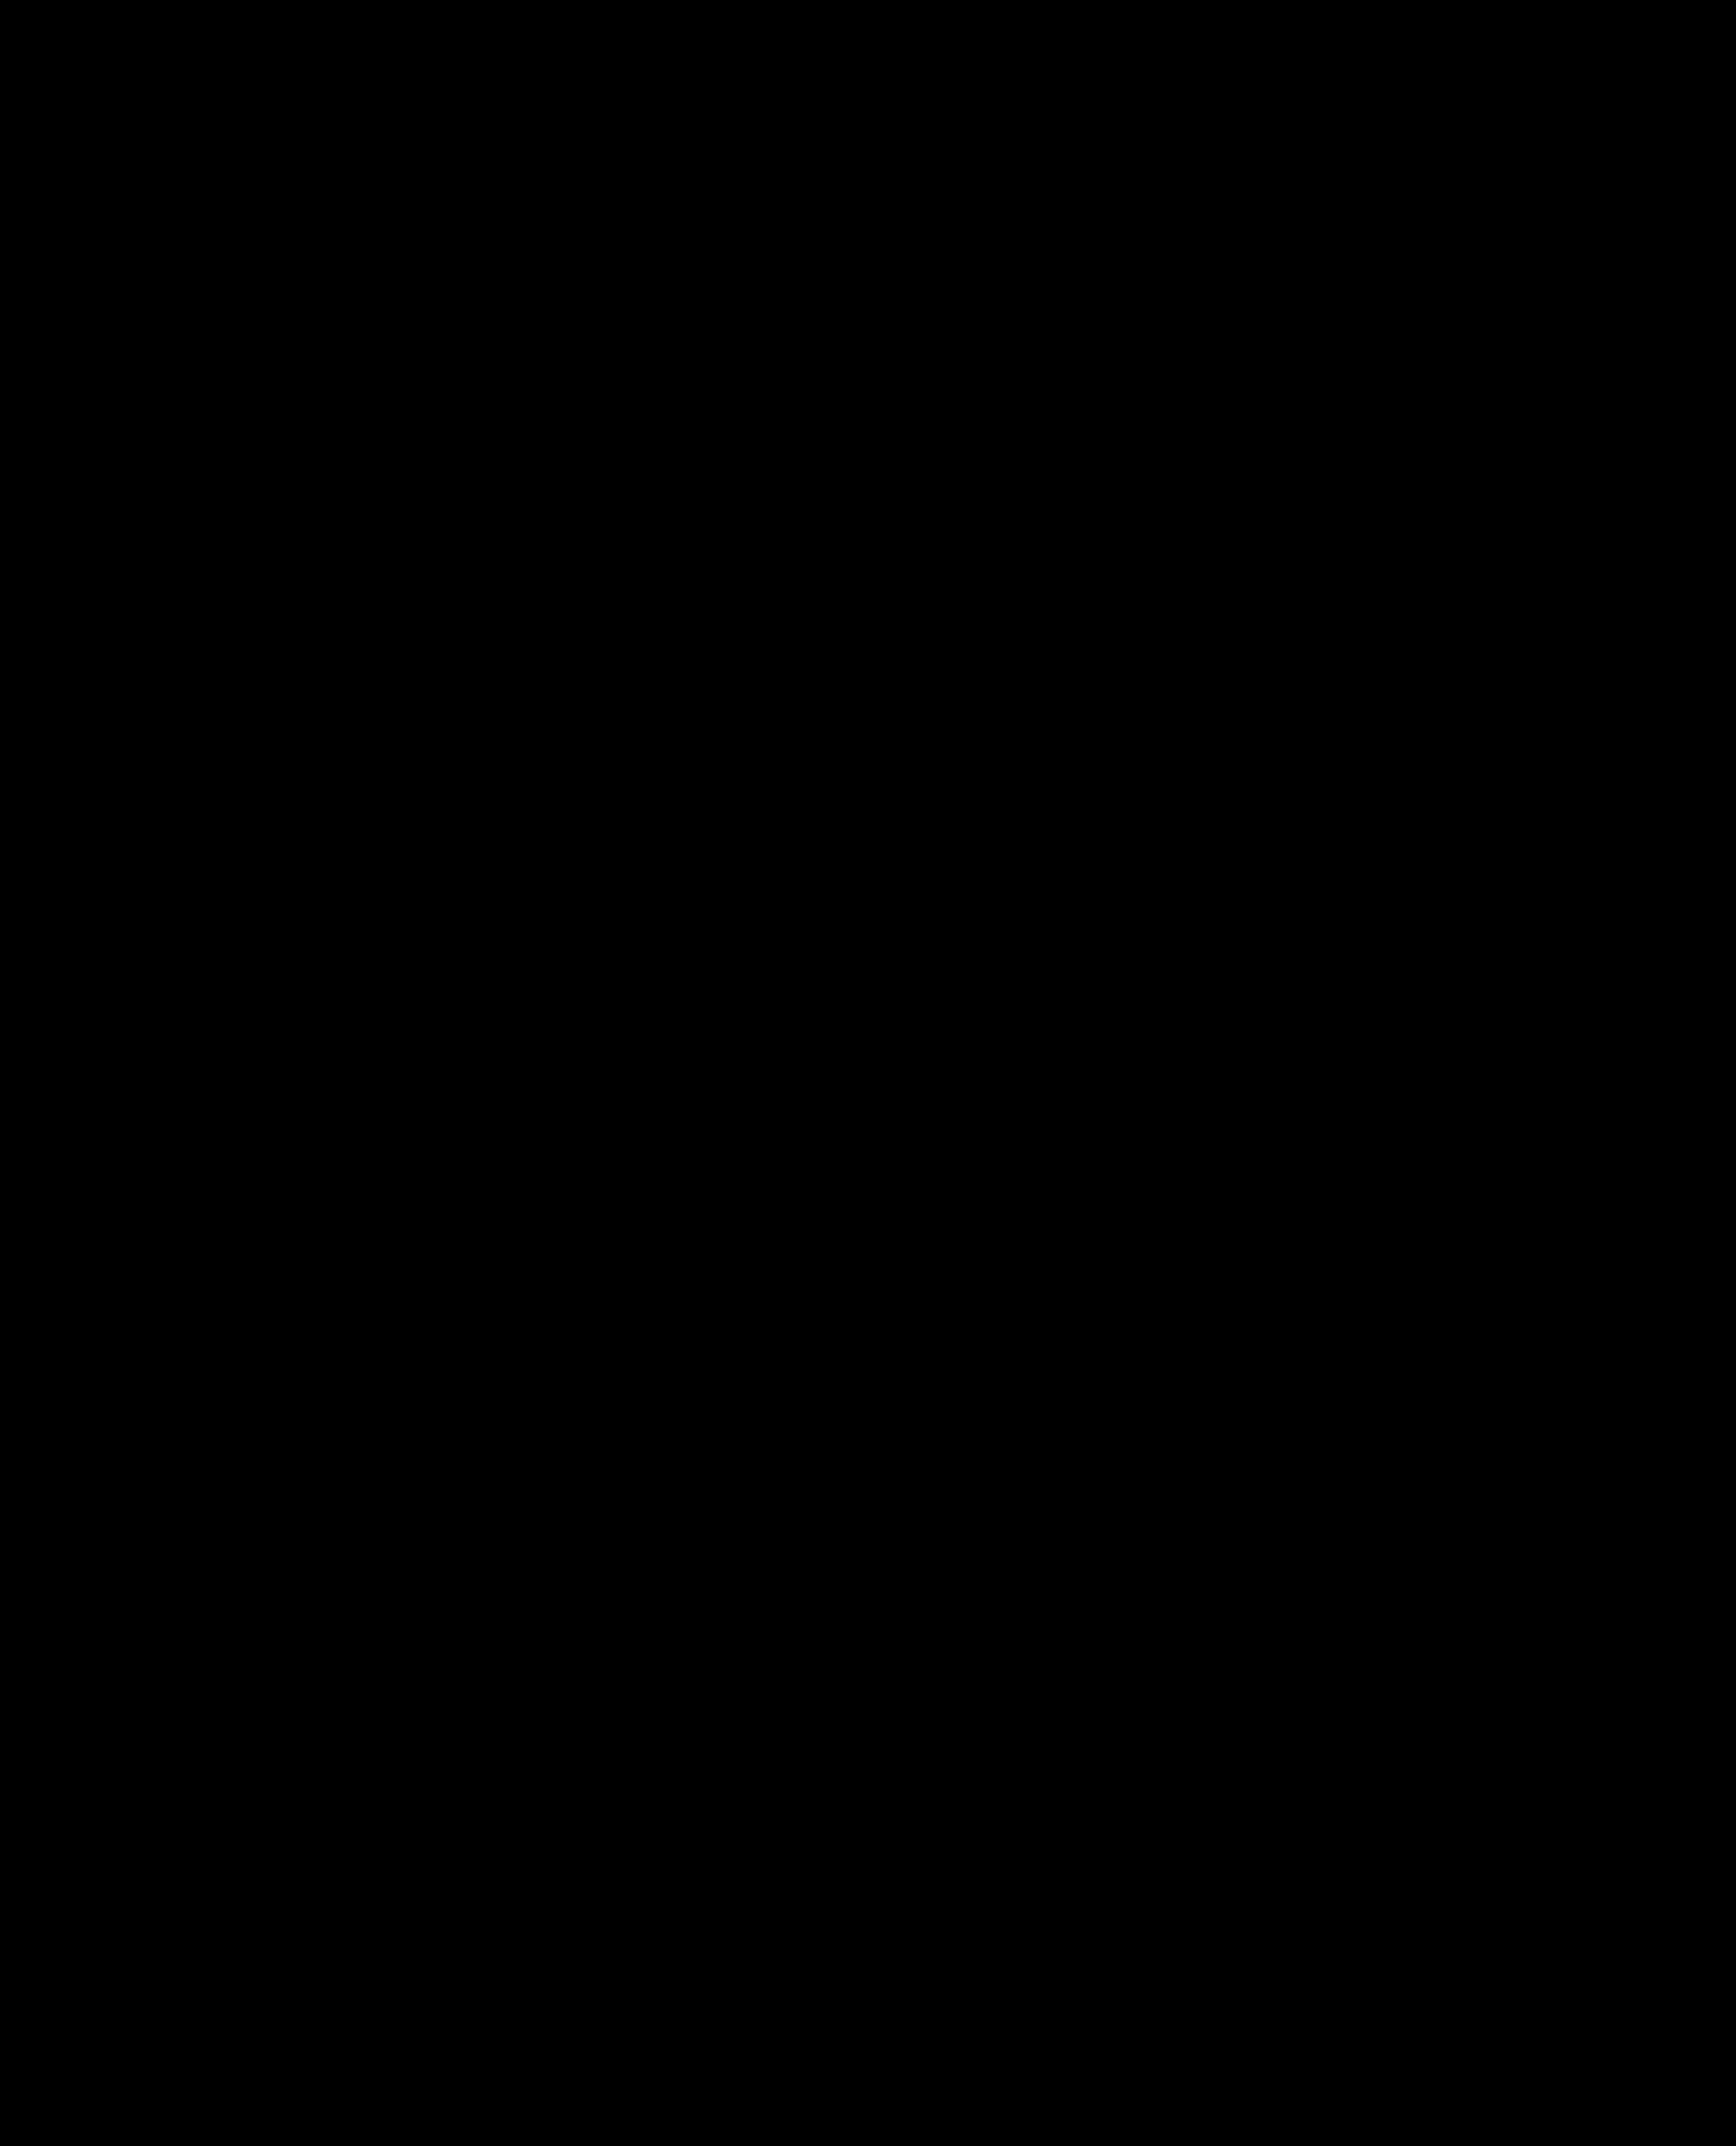 Aurea-ultra-billboard